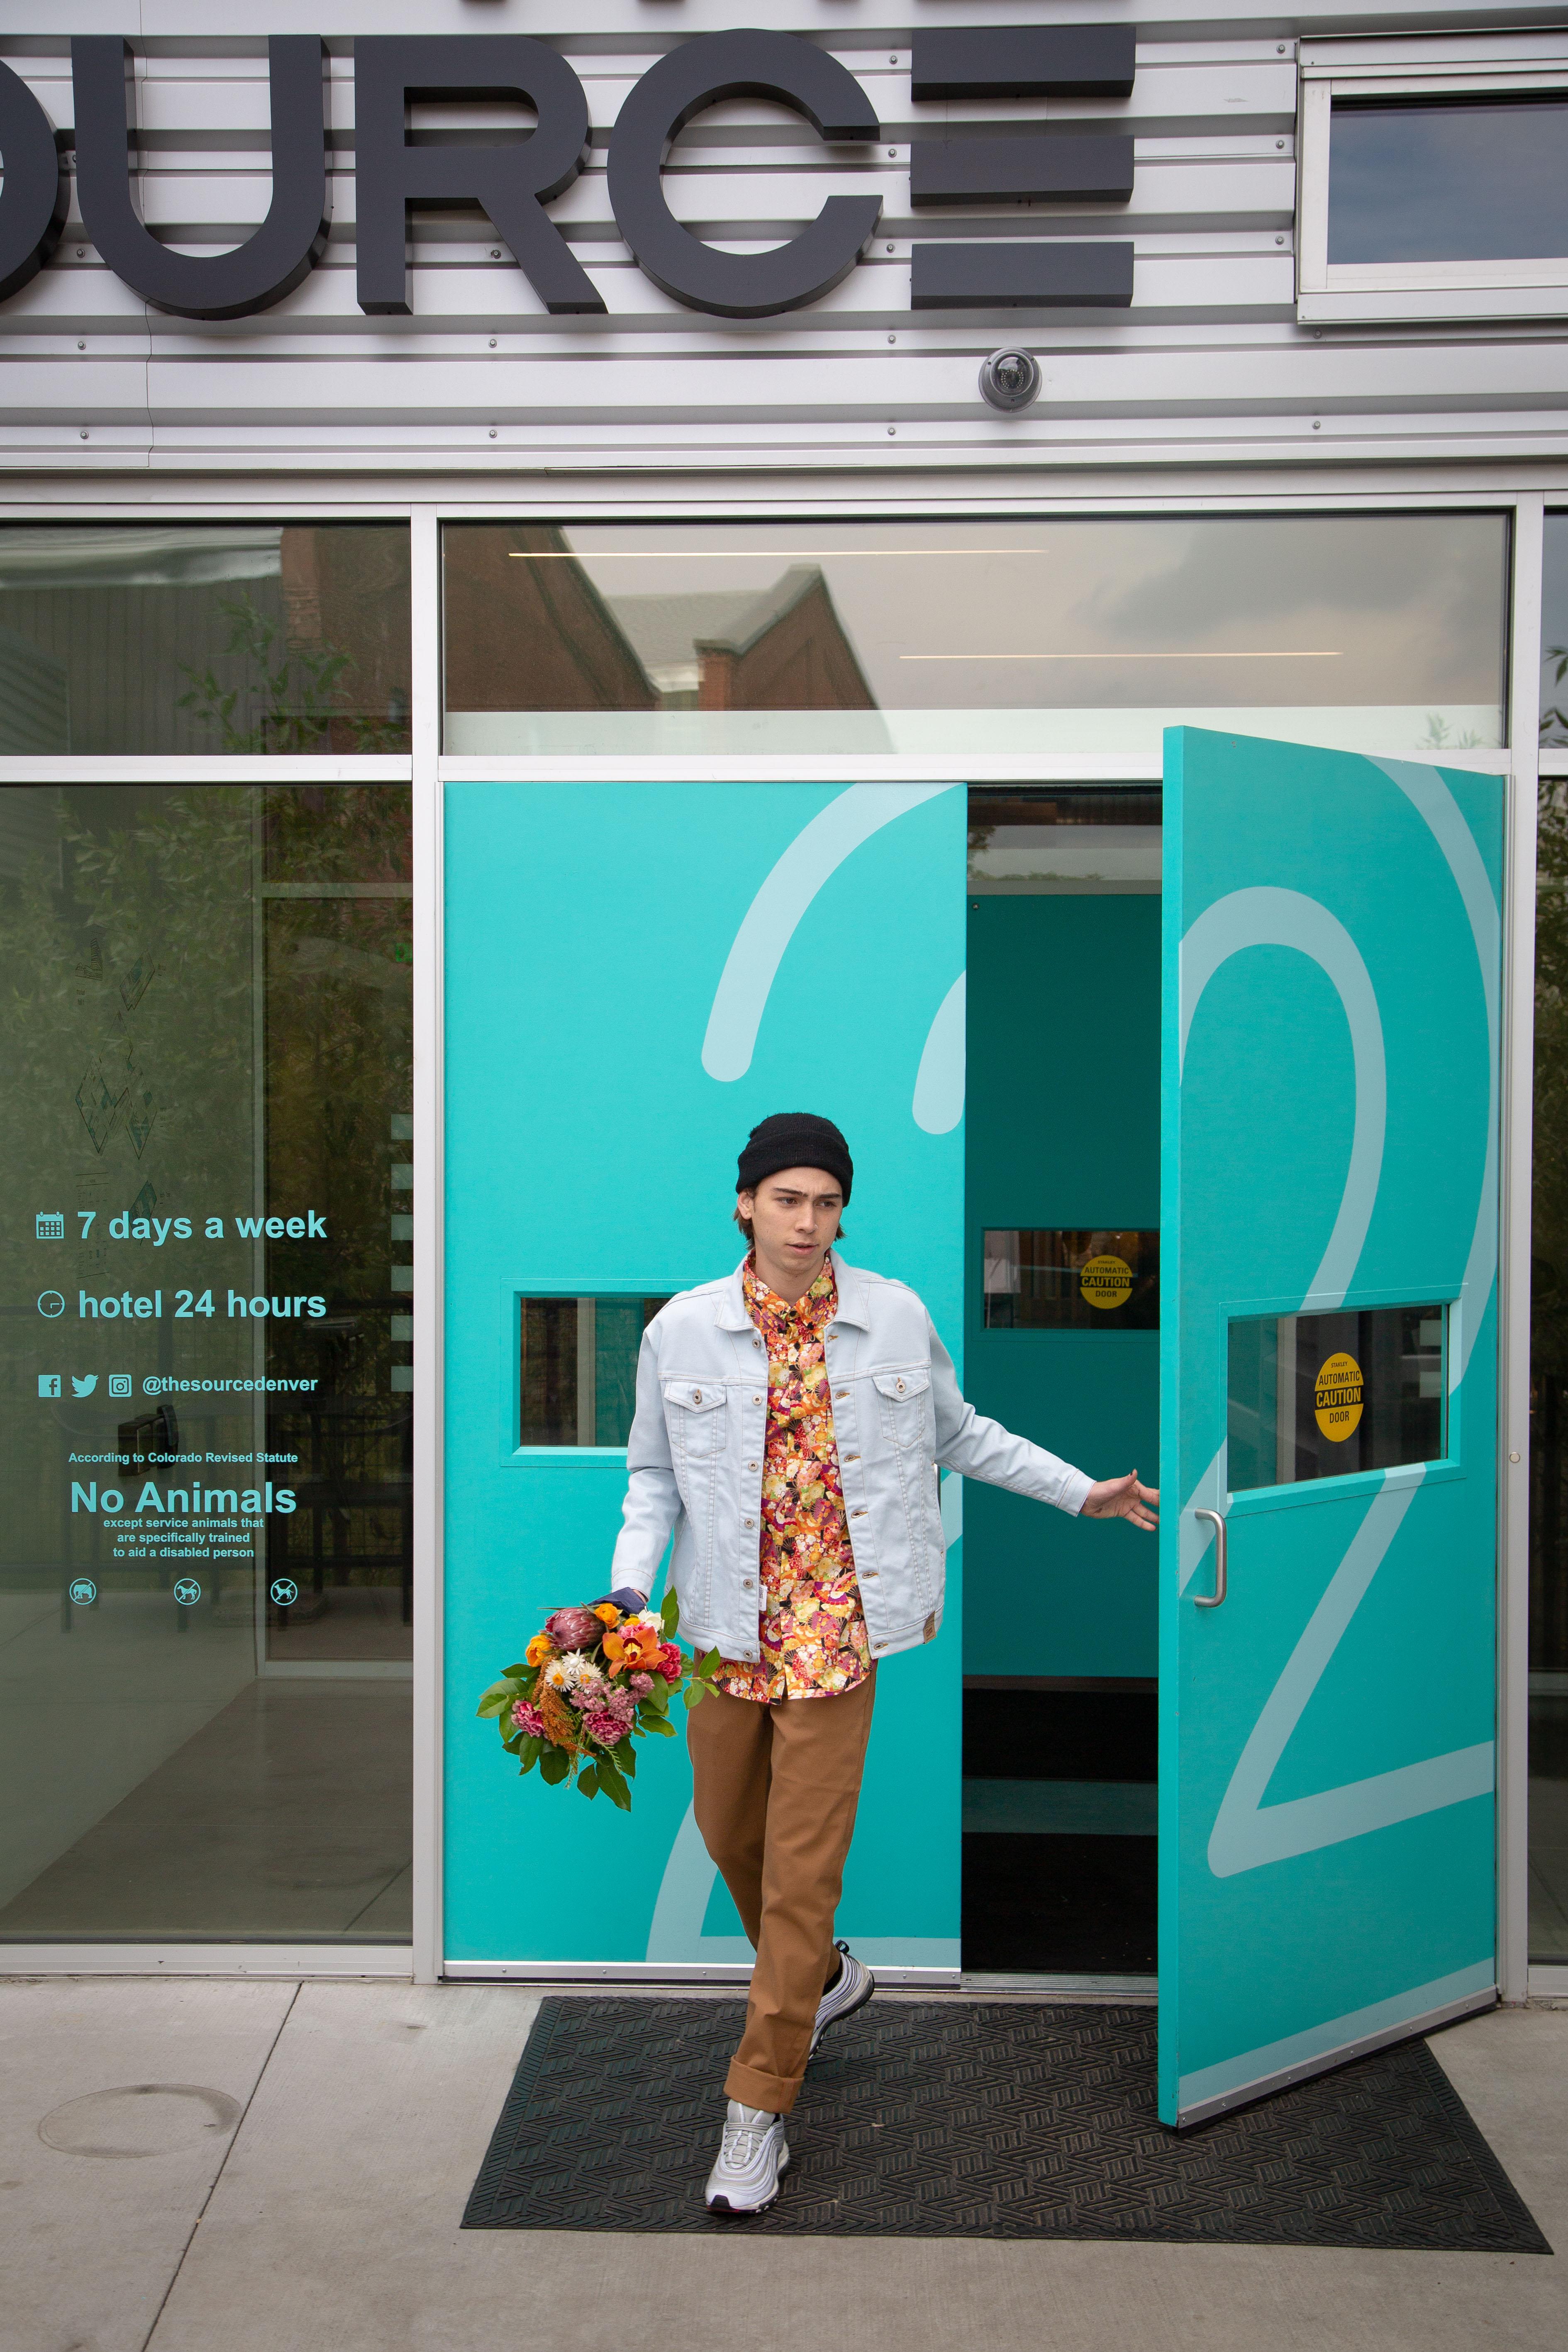 086_Zeppelin_Source Hotel Lifestyle_72DPI